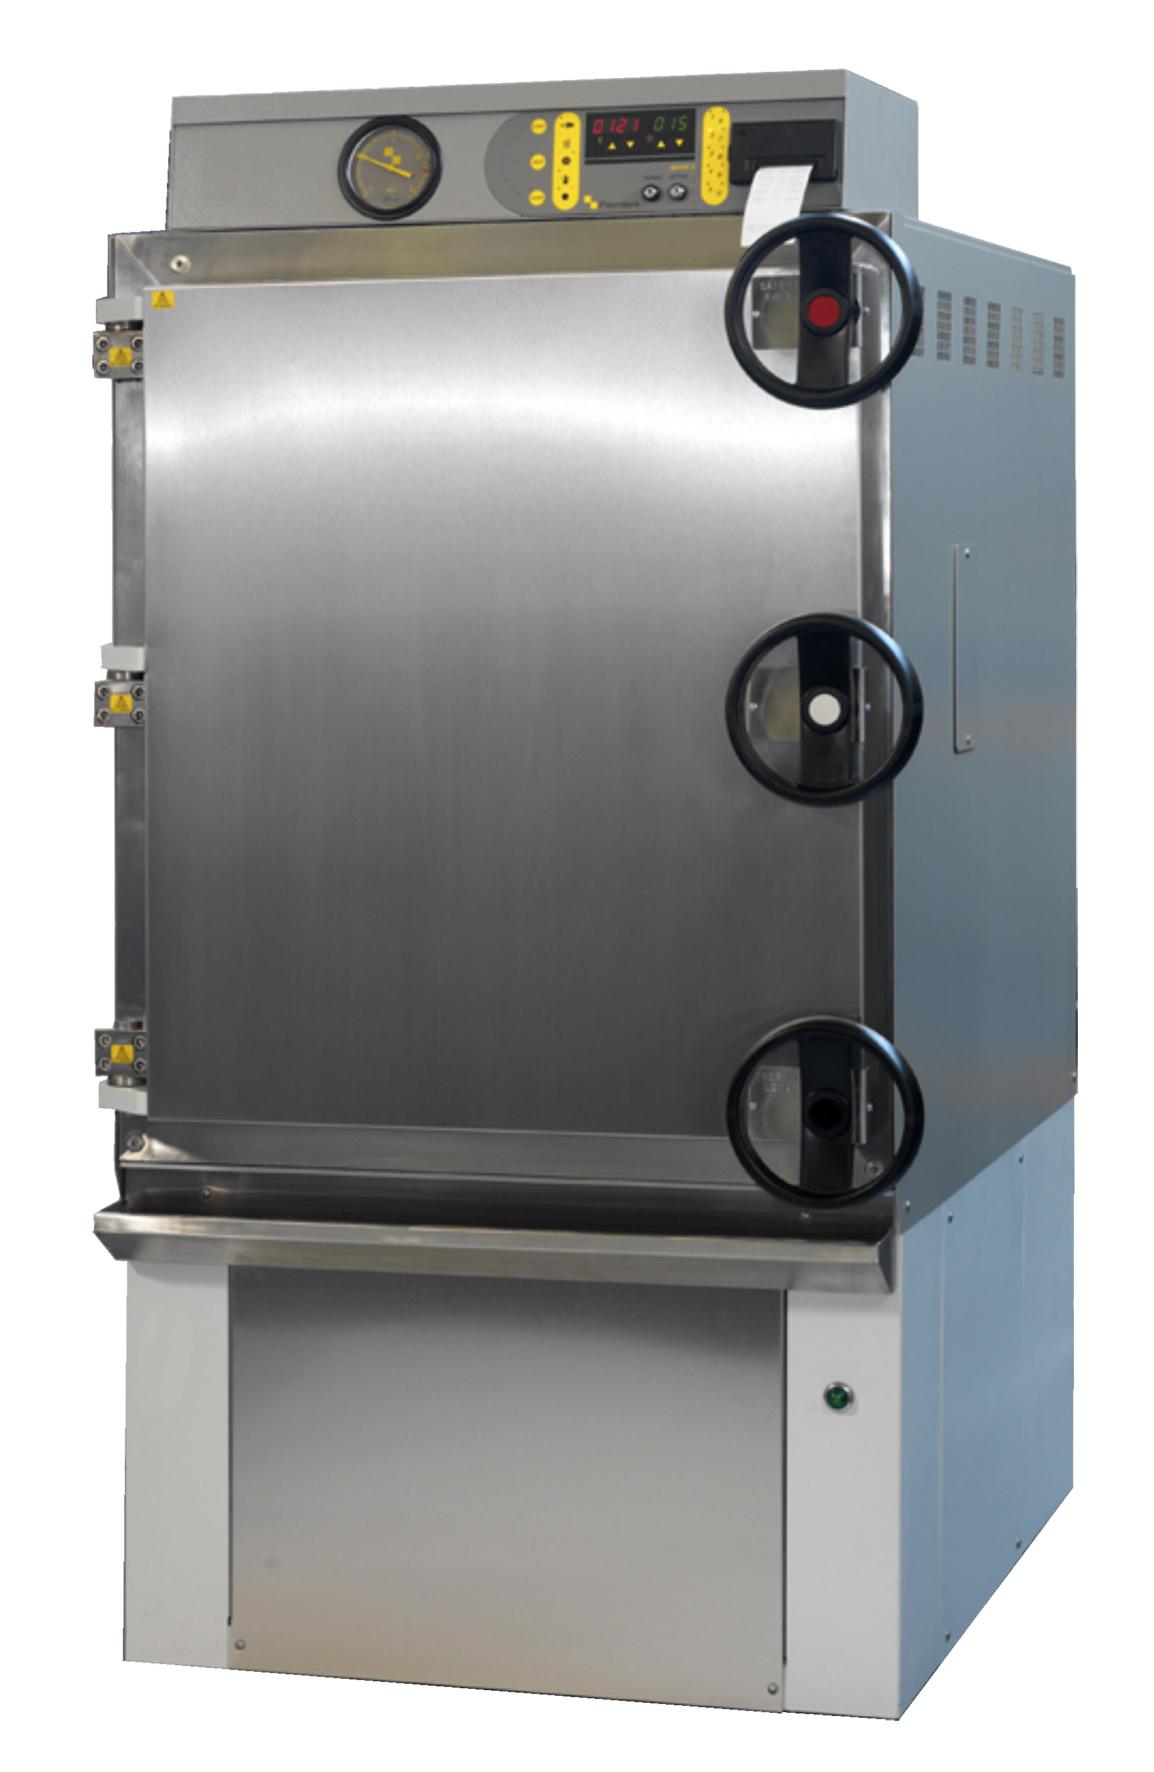 Autoclave cuts sterilising costs